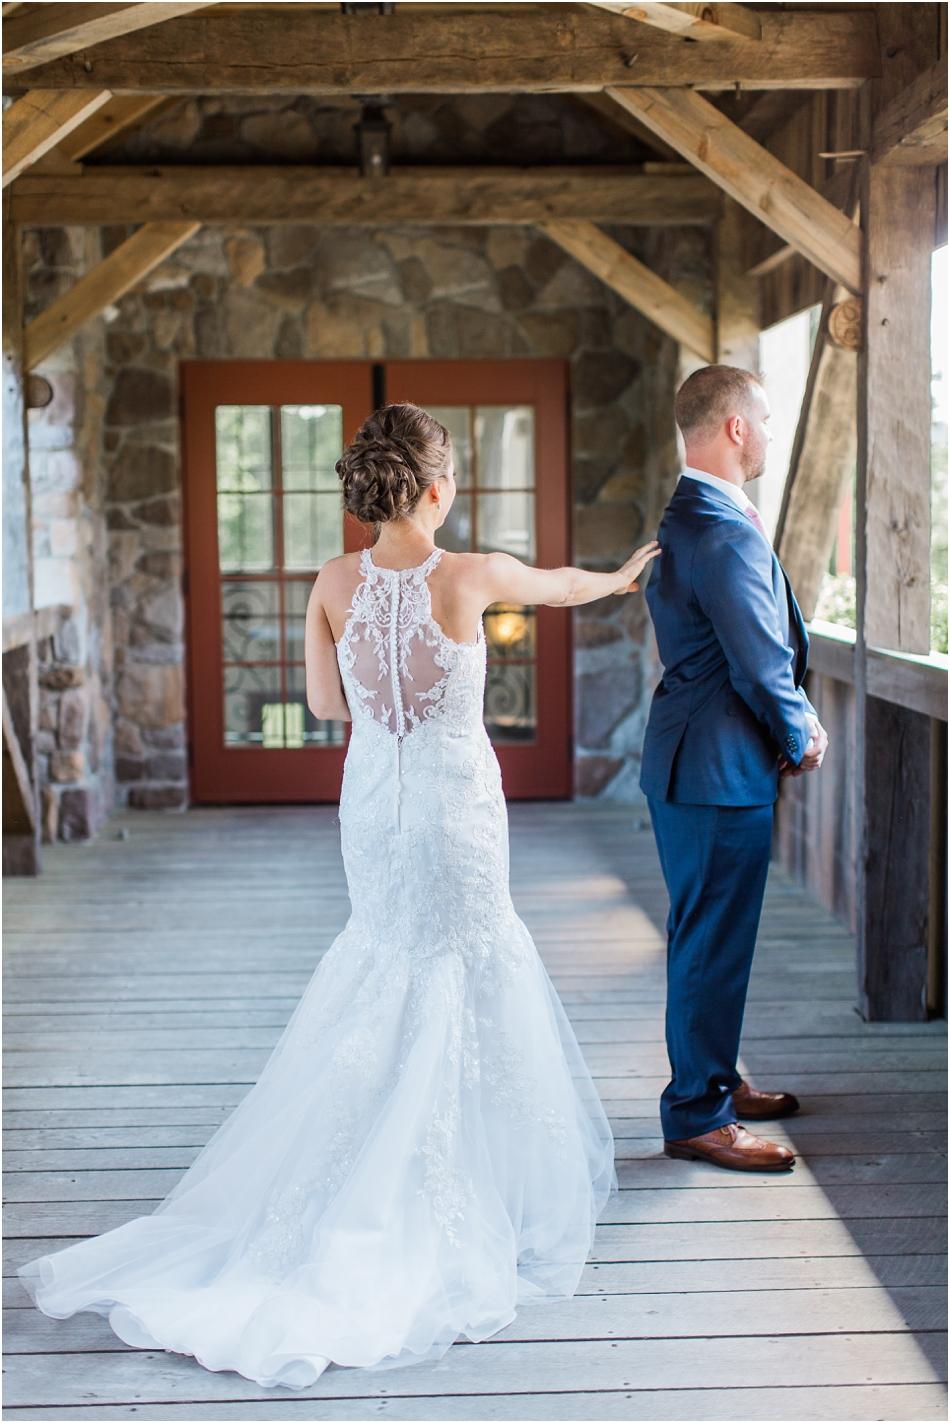 pine_hills_mirbeau_golf_club_boston_massachusetts_cape_cod_new_england_wedding_photographer_Meredith_Jane_Photography_photo_1683.jpg